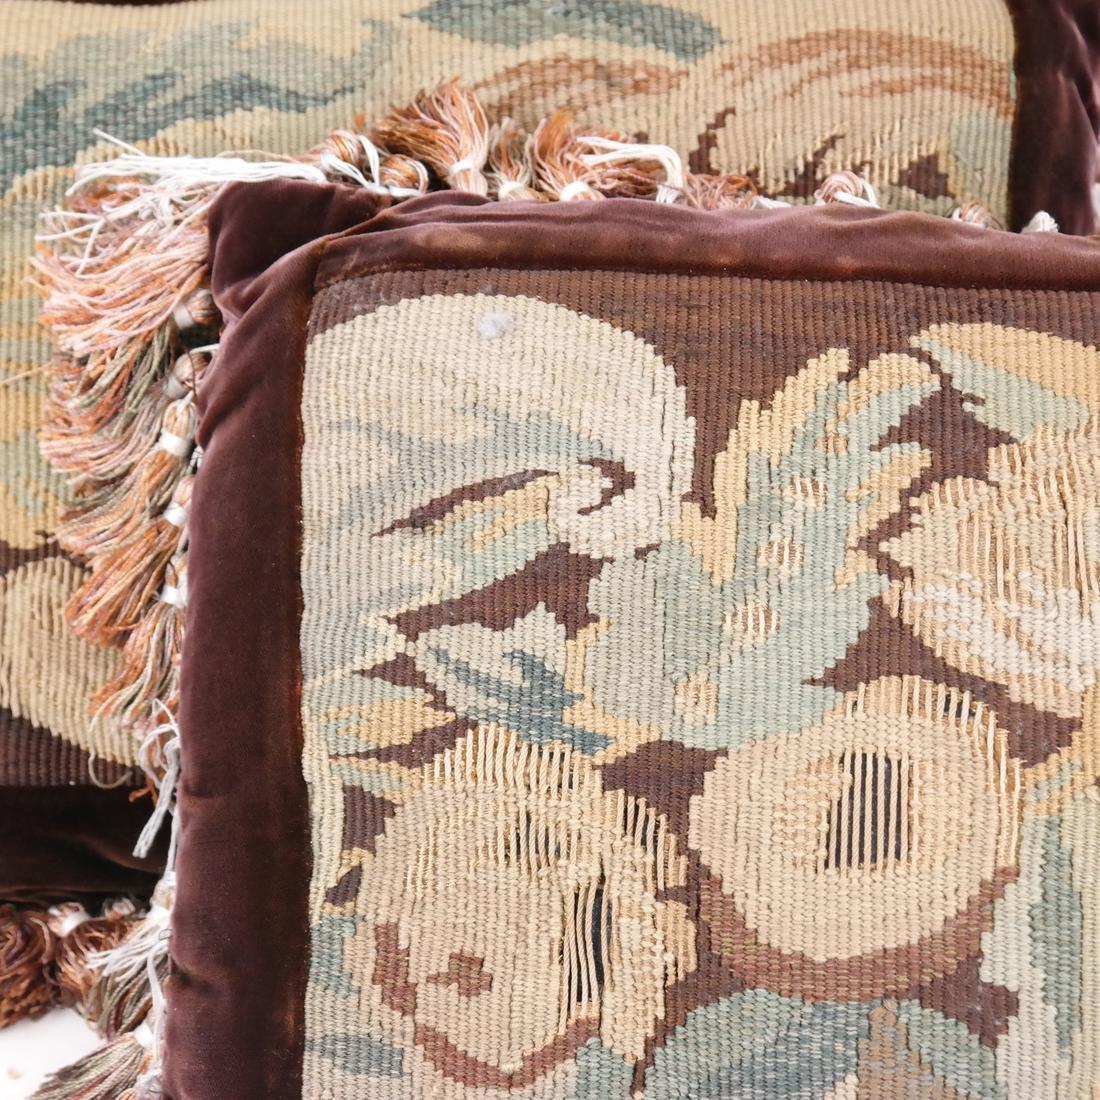 Pair of Needlepoint Pillows - 2